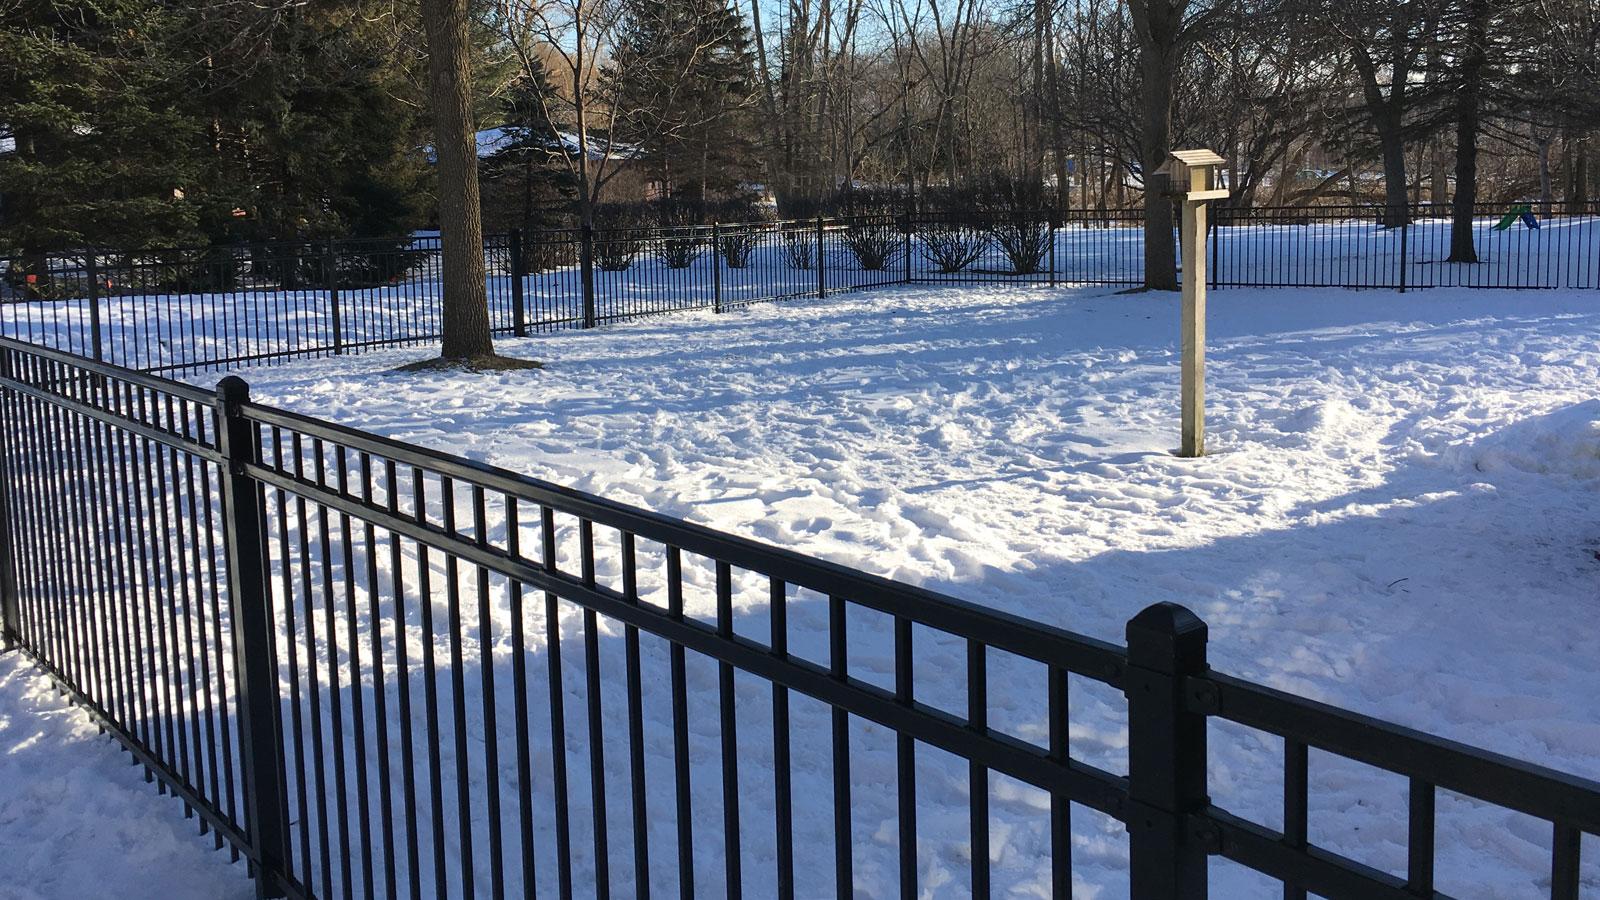 Winter Installs <!--Classic Steel Fences-->